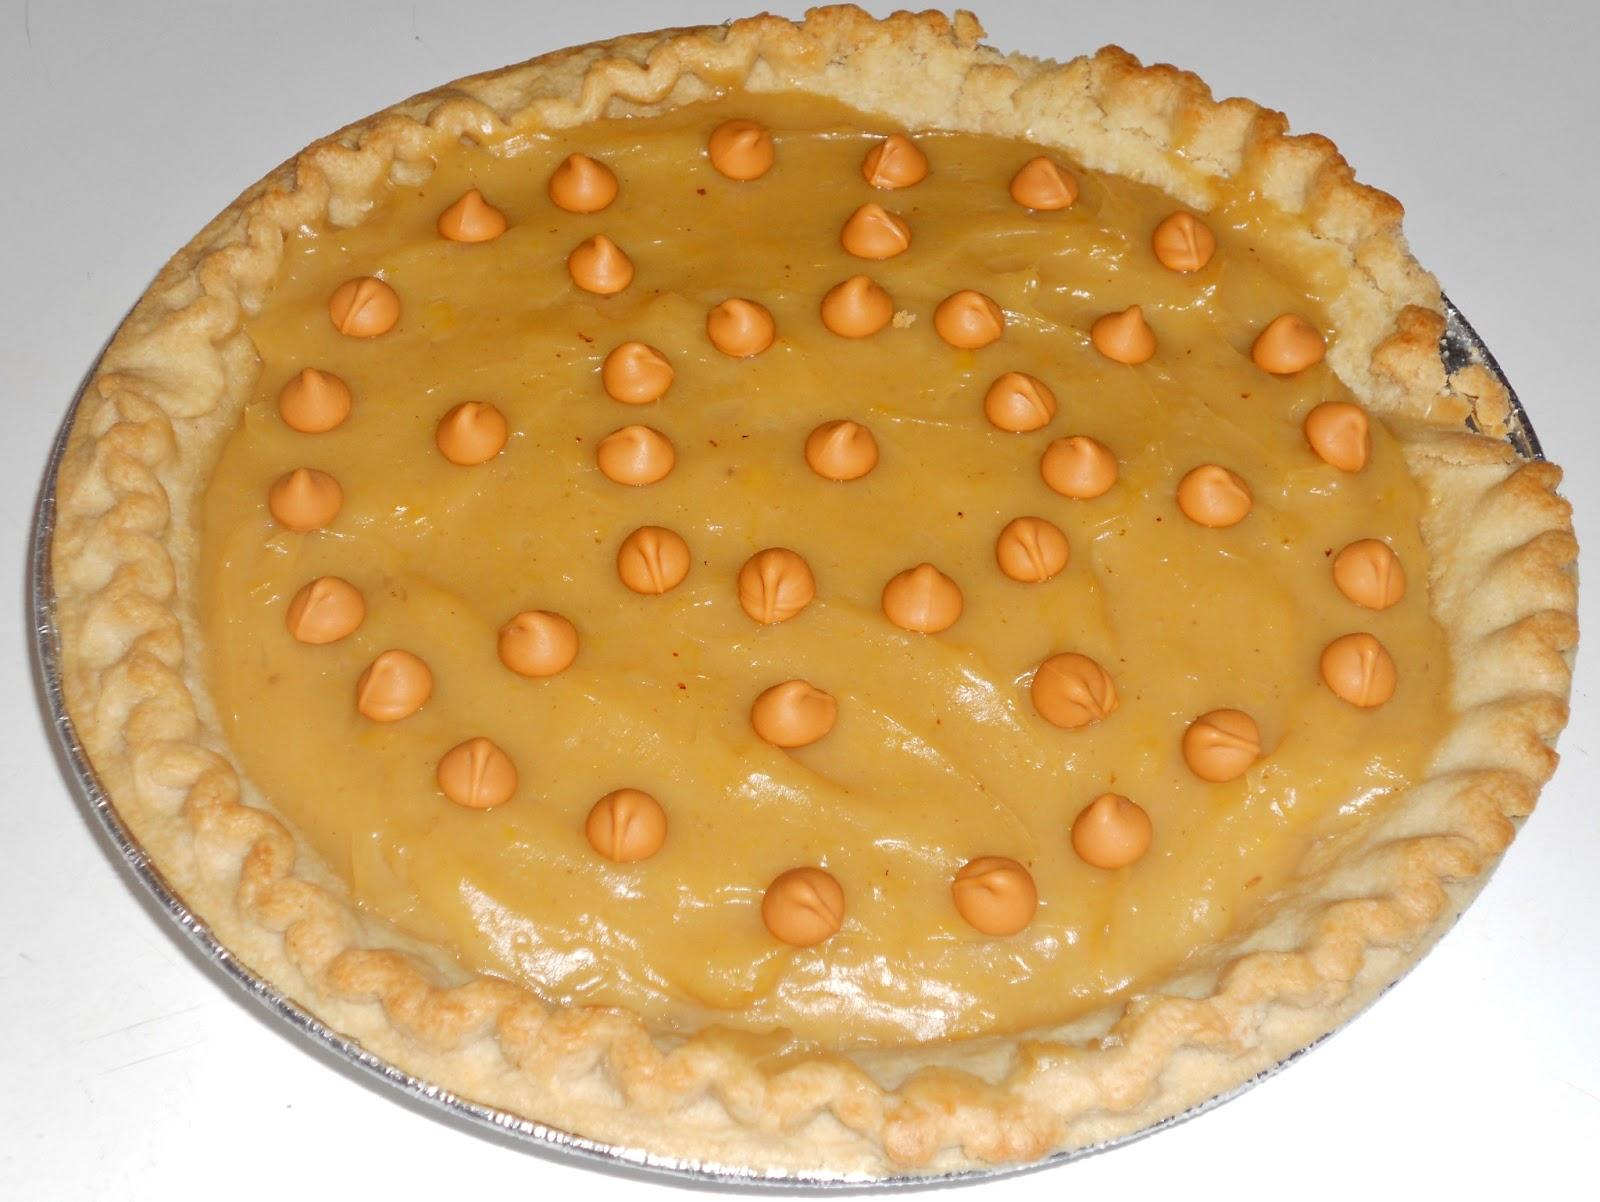 ... , Pies, & Preschool Pizzazz: Friday Pie-Day: Butterscotch Pie